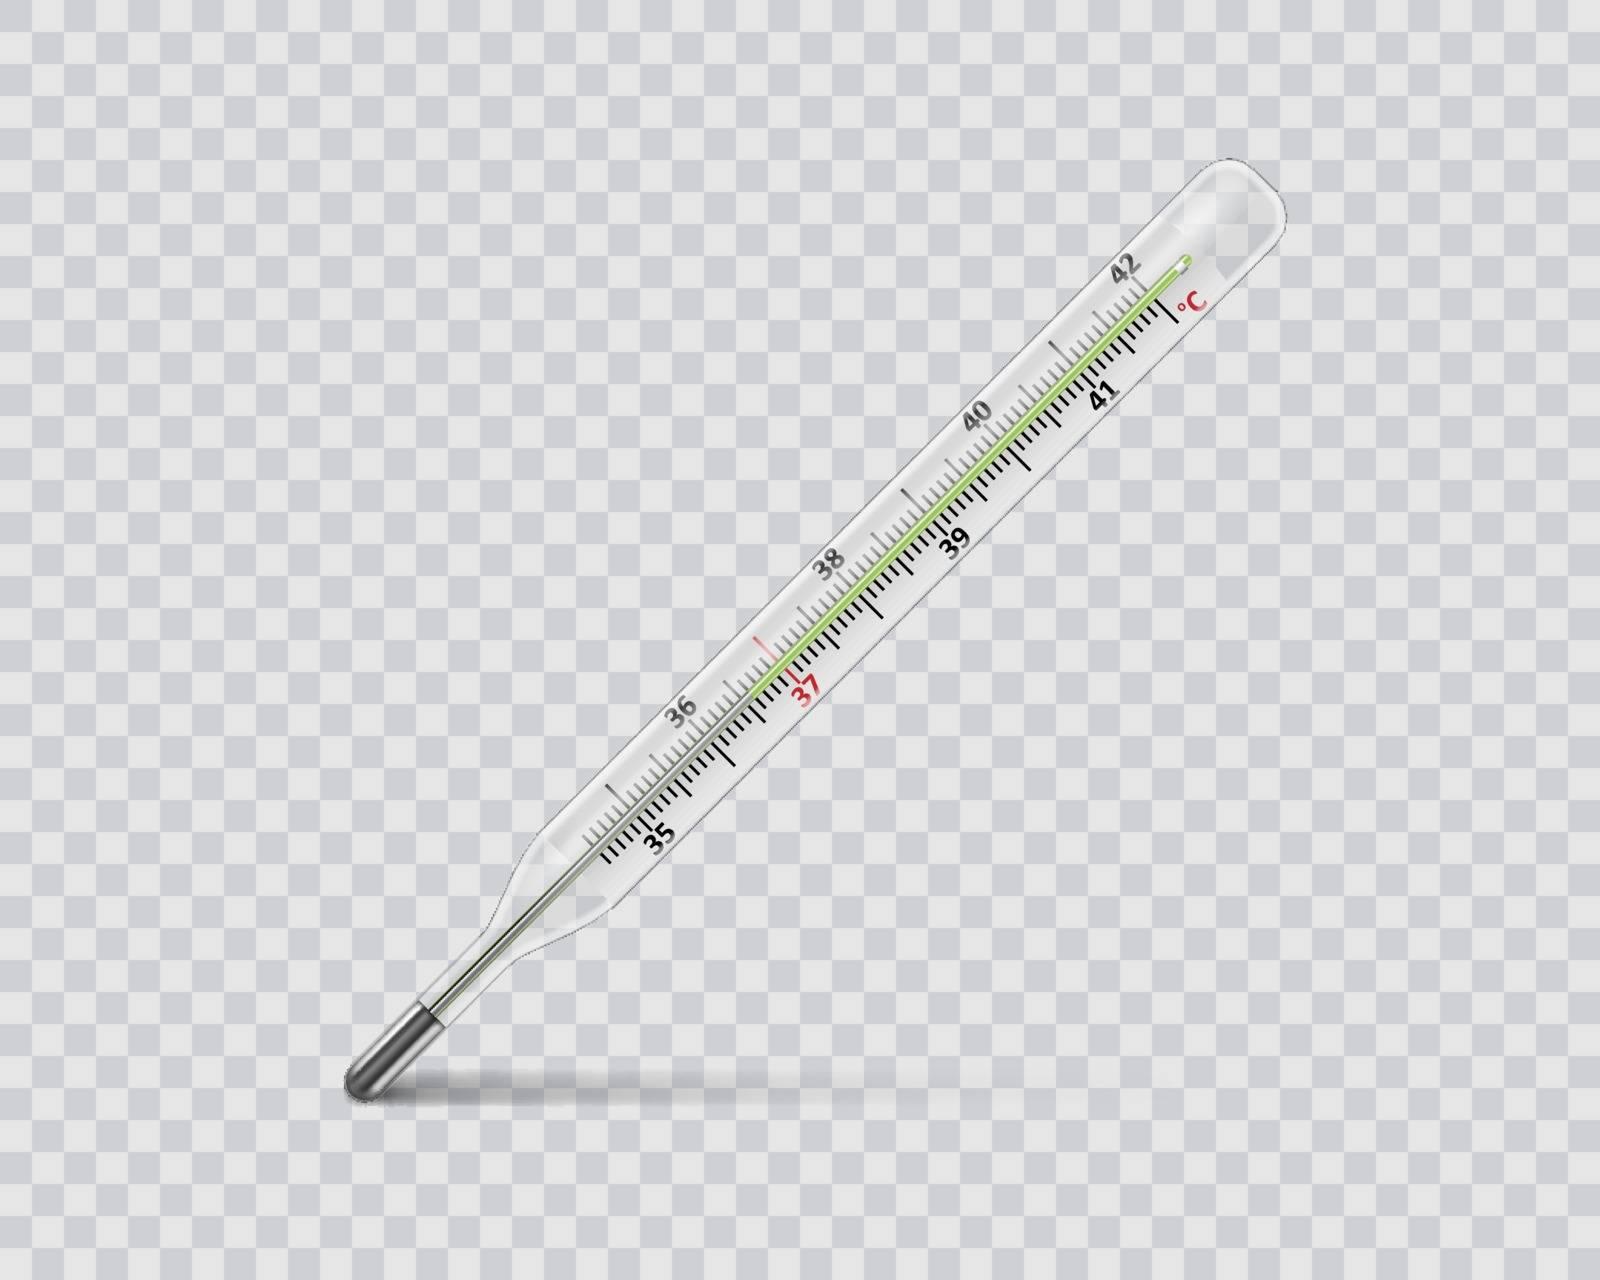 Medical mercury thermometer on transparent background. Realistic temperature diagnostic measurement instrument. vector illustration EPS 10